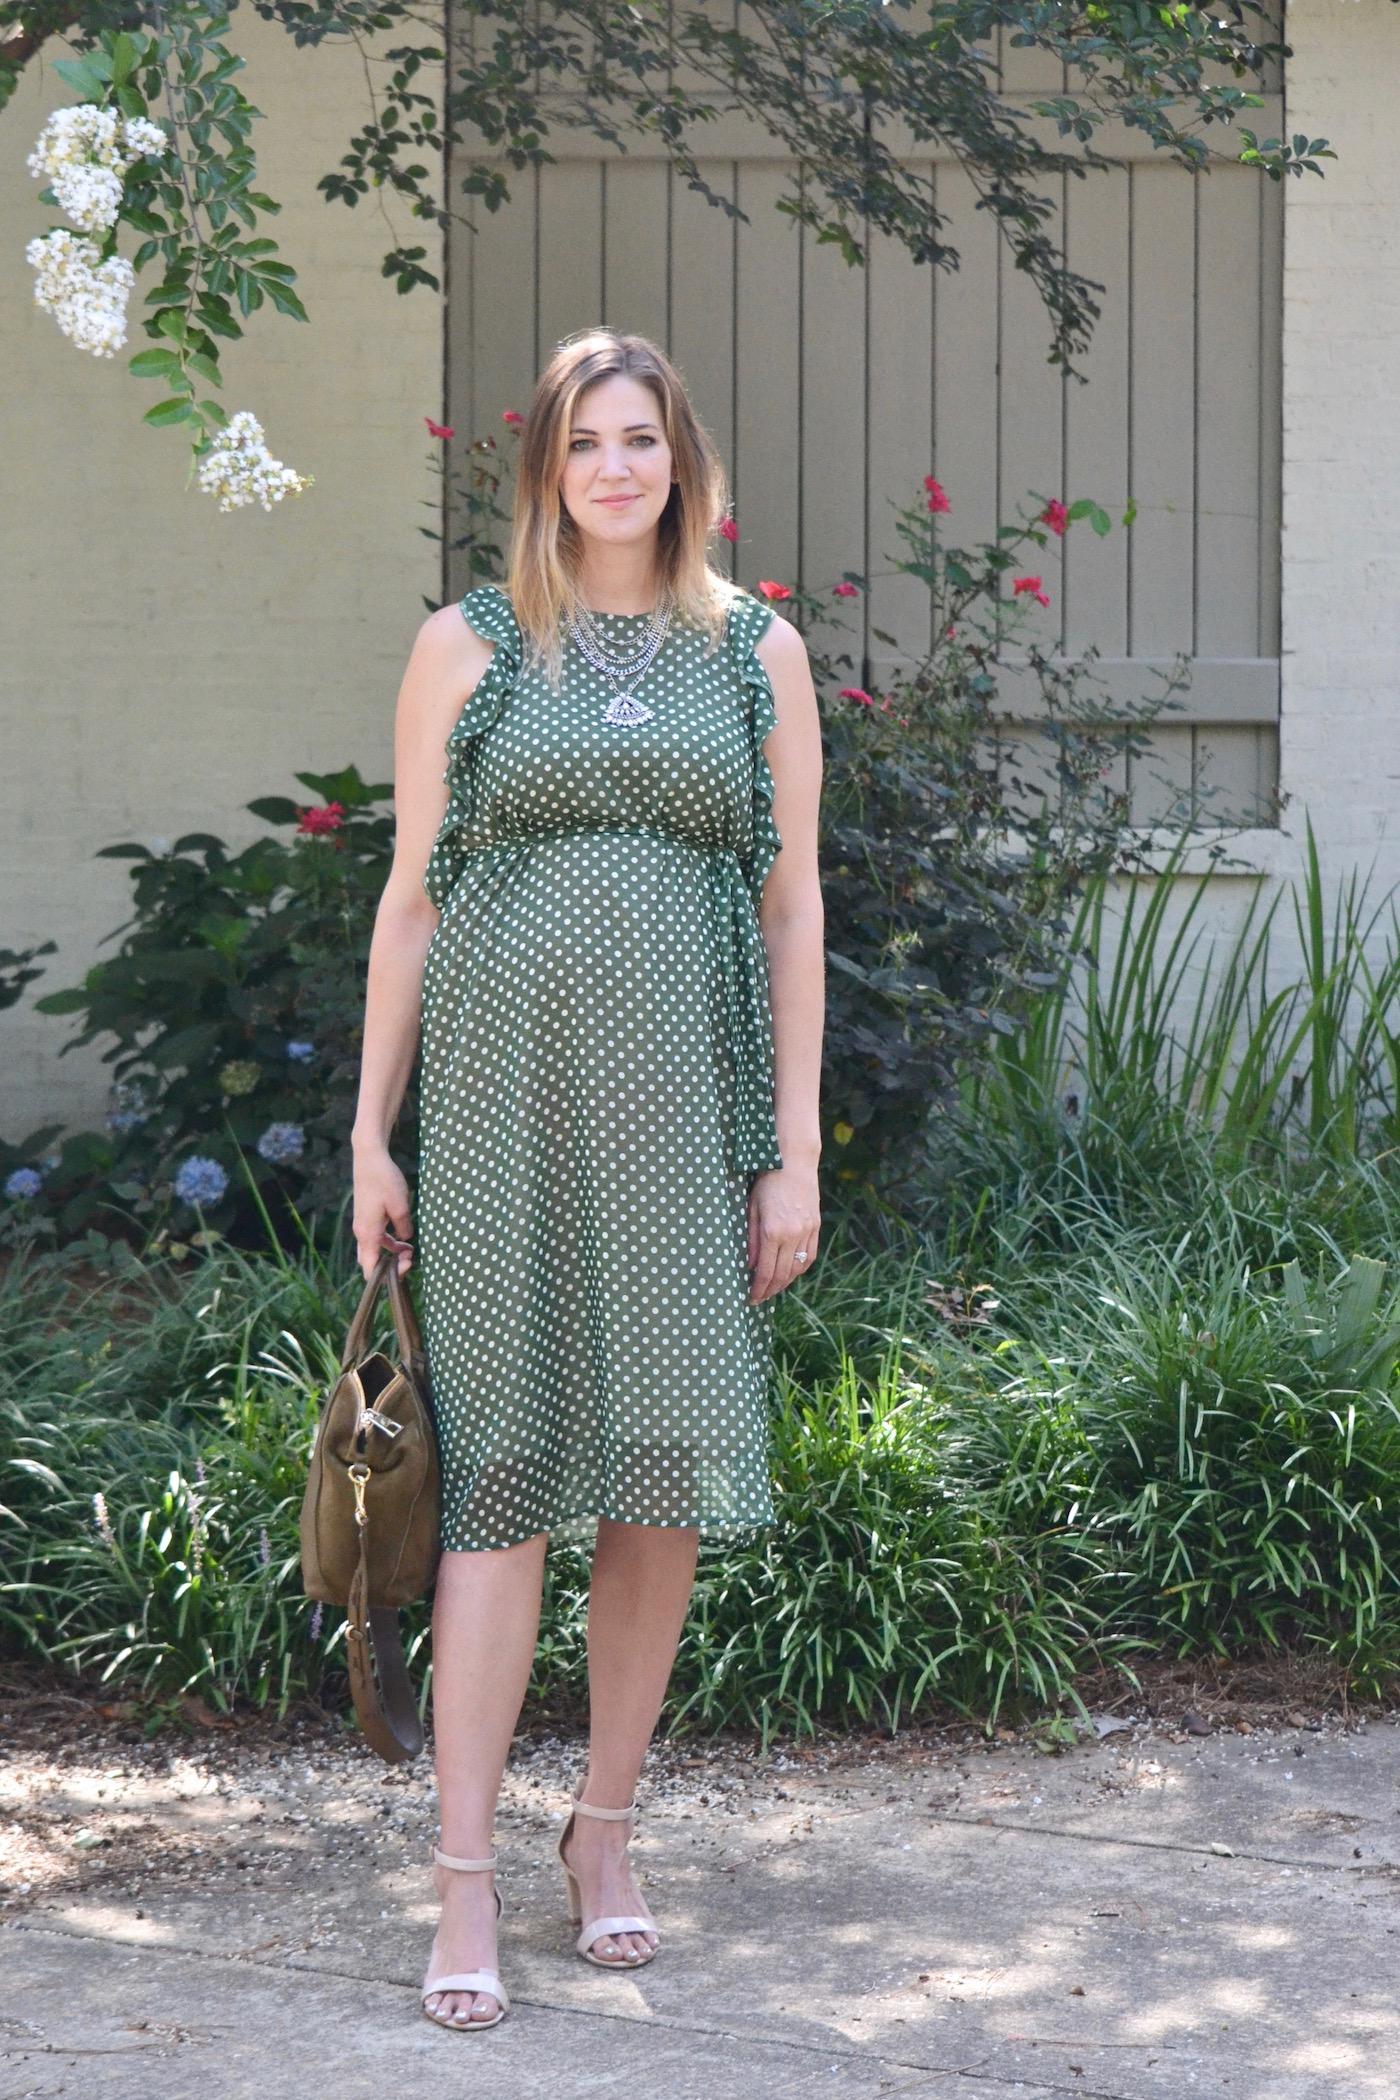 Polka Polka // second trimester maternity style // www.thehiveblog.com